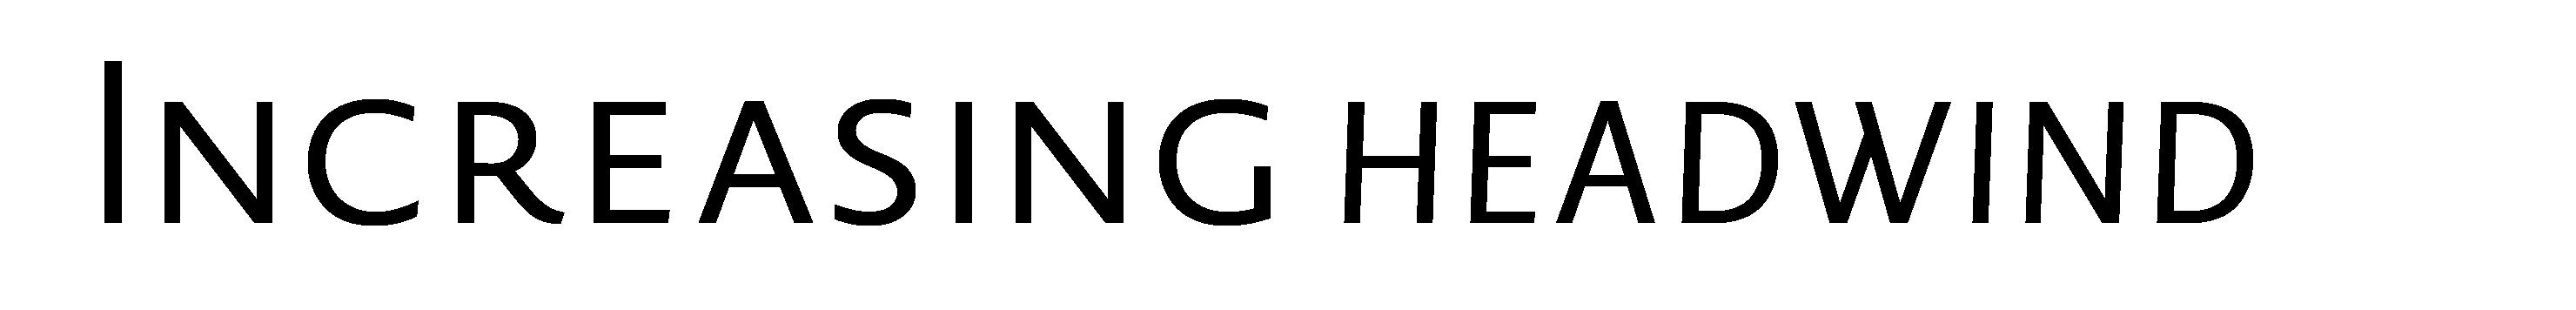 Typeface Novel Sans D08 Atlas Font Foundry